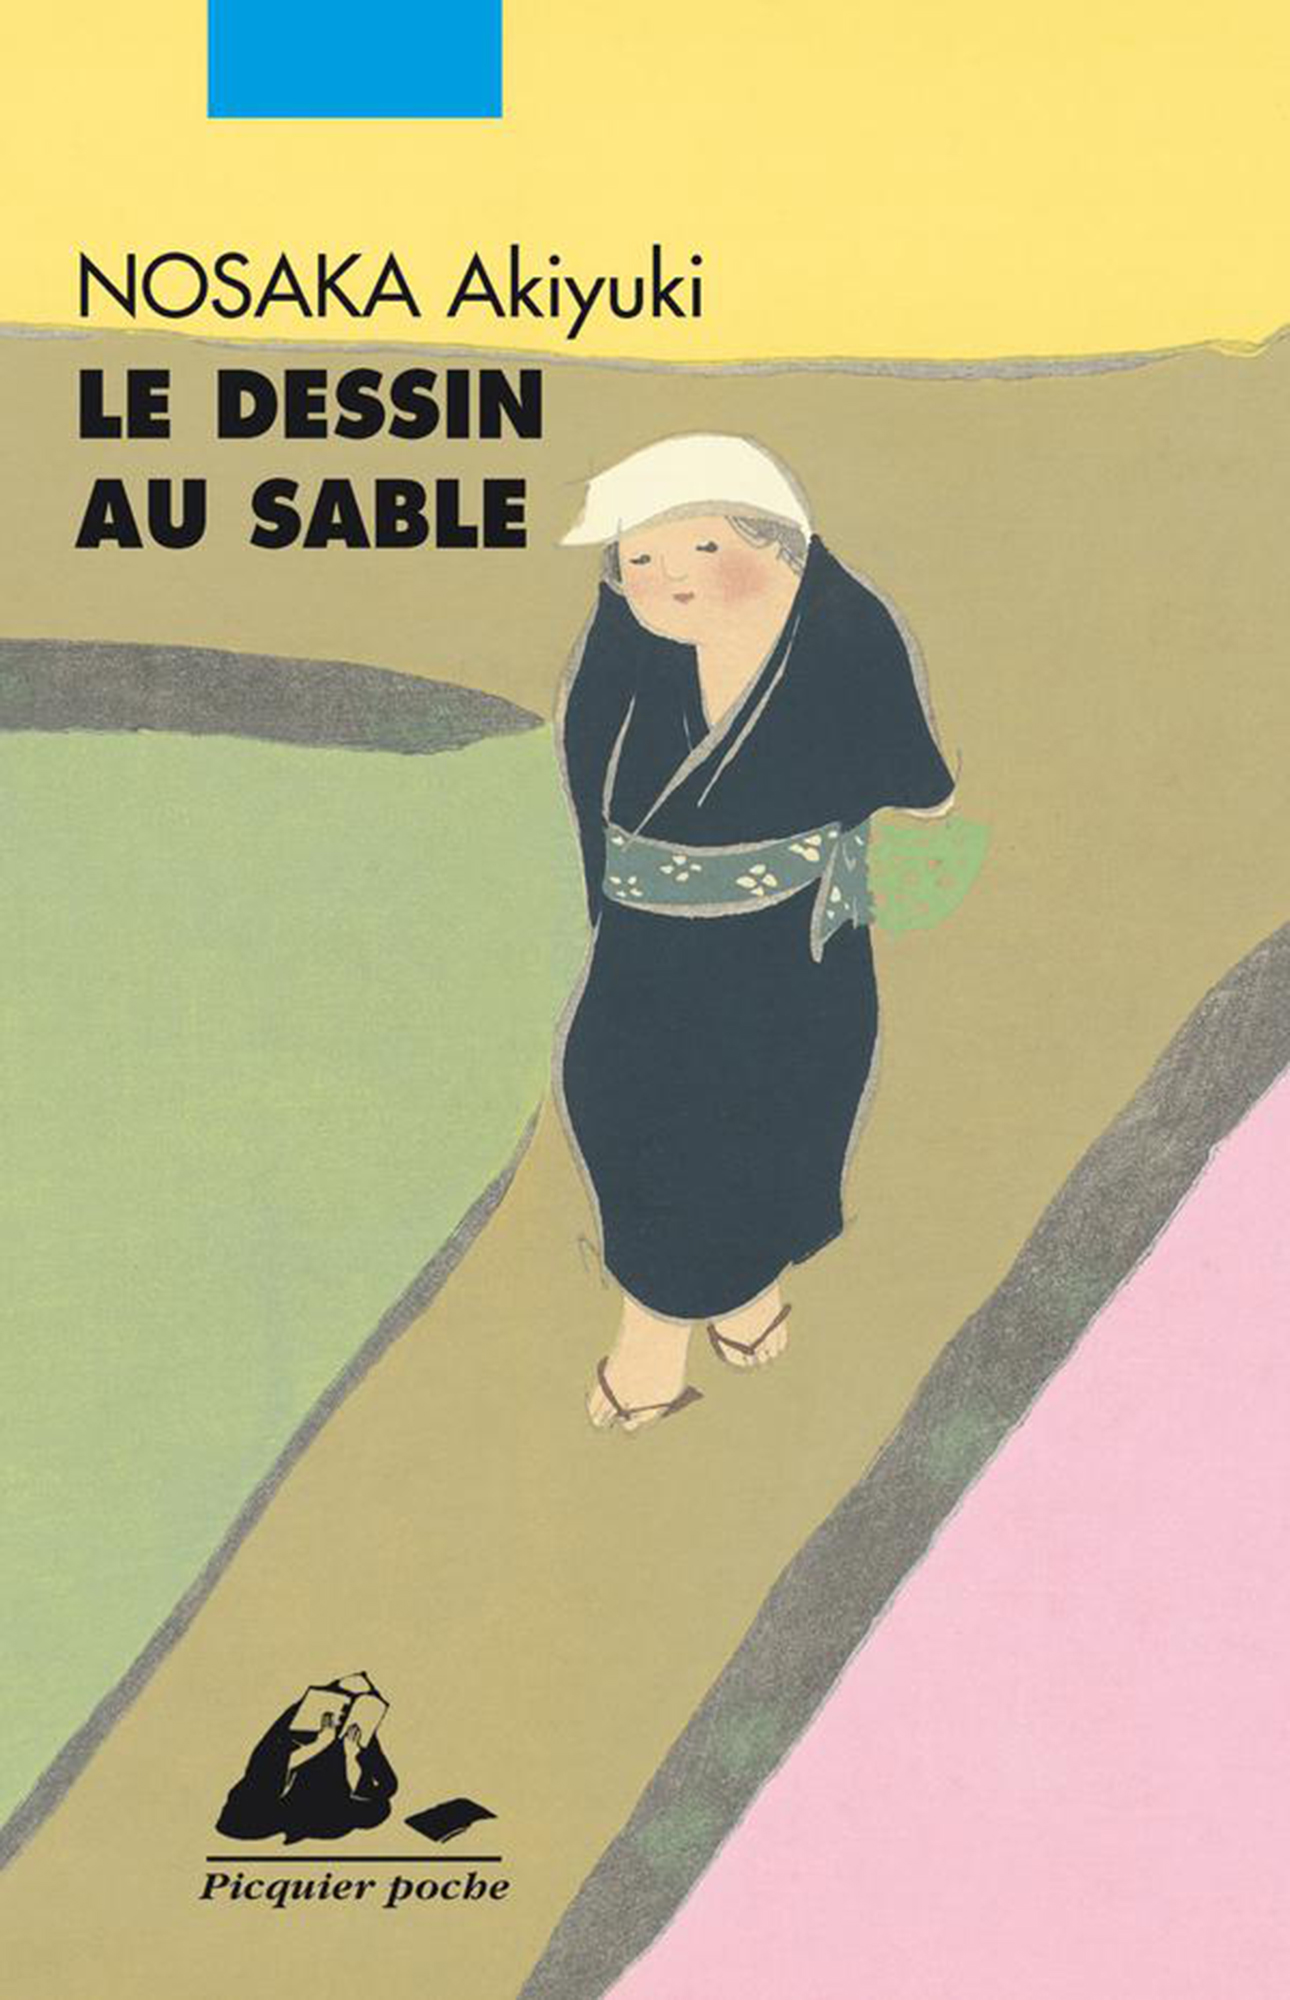 Le Dessin au sable | NOSAKA, Akiyuki